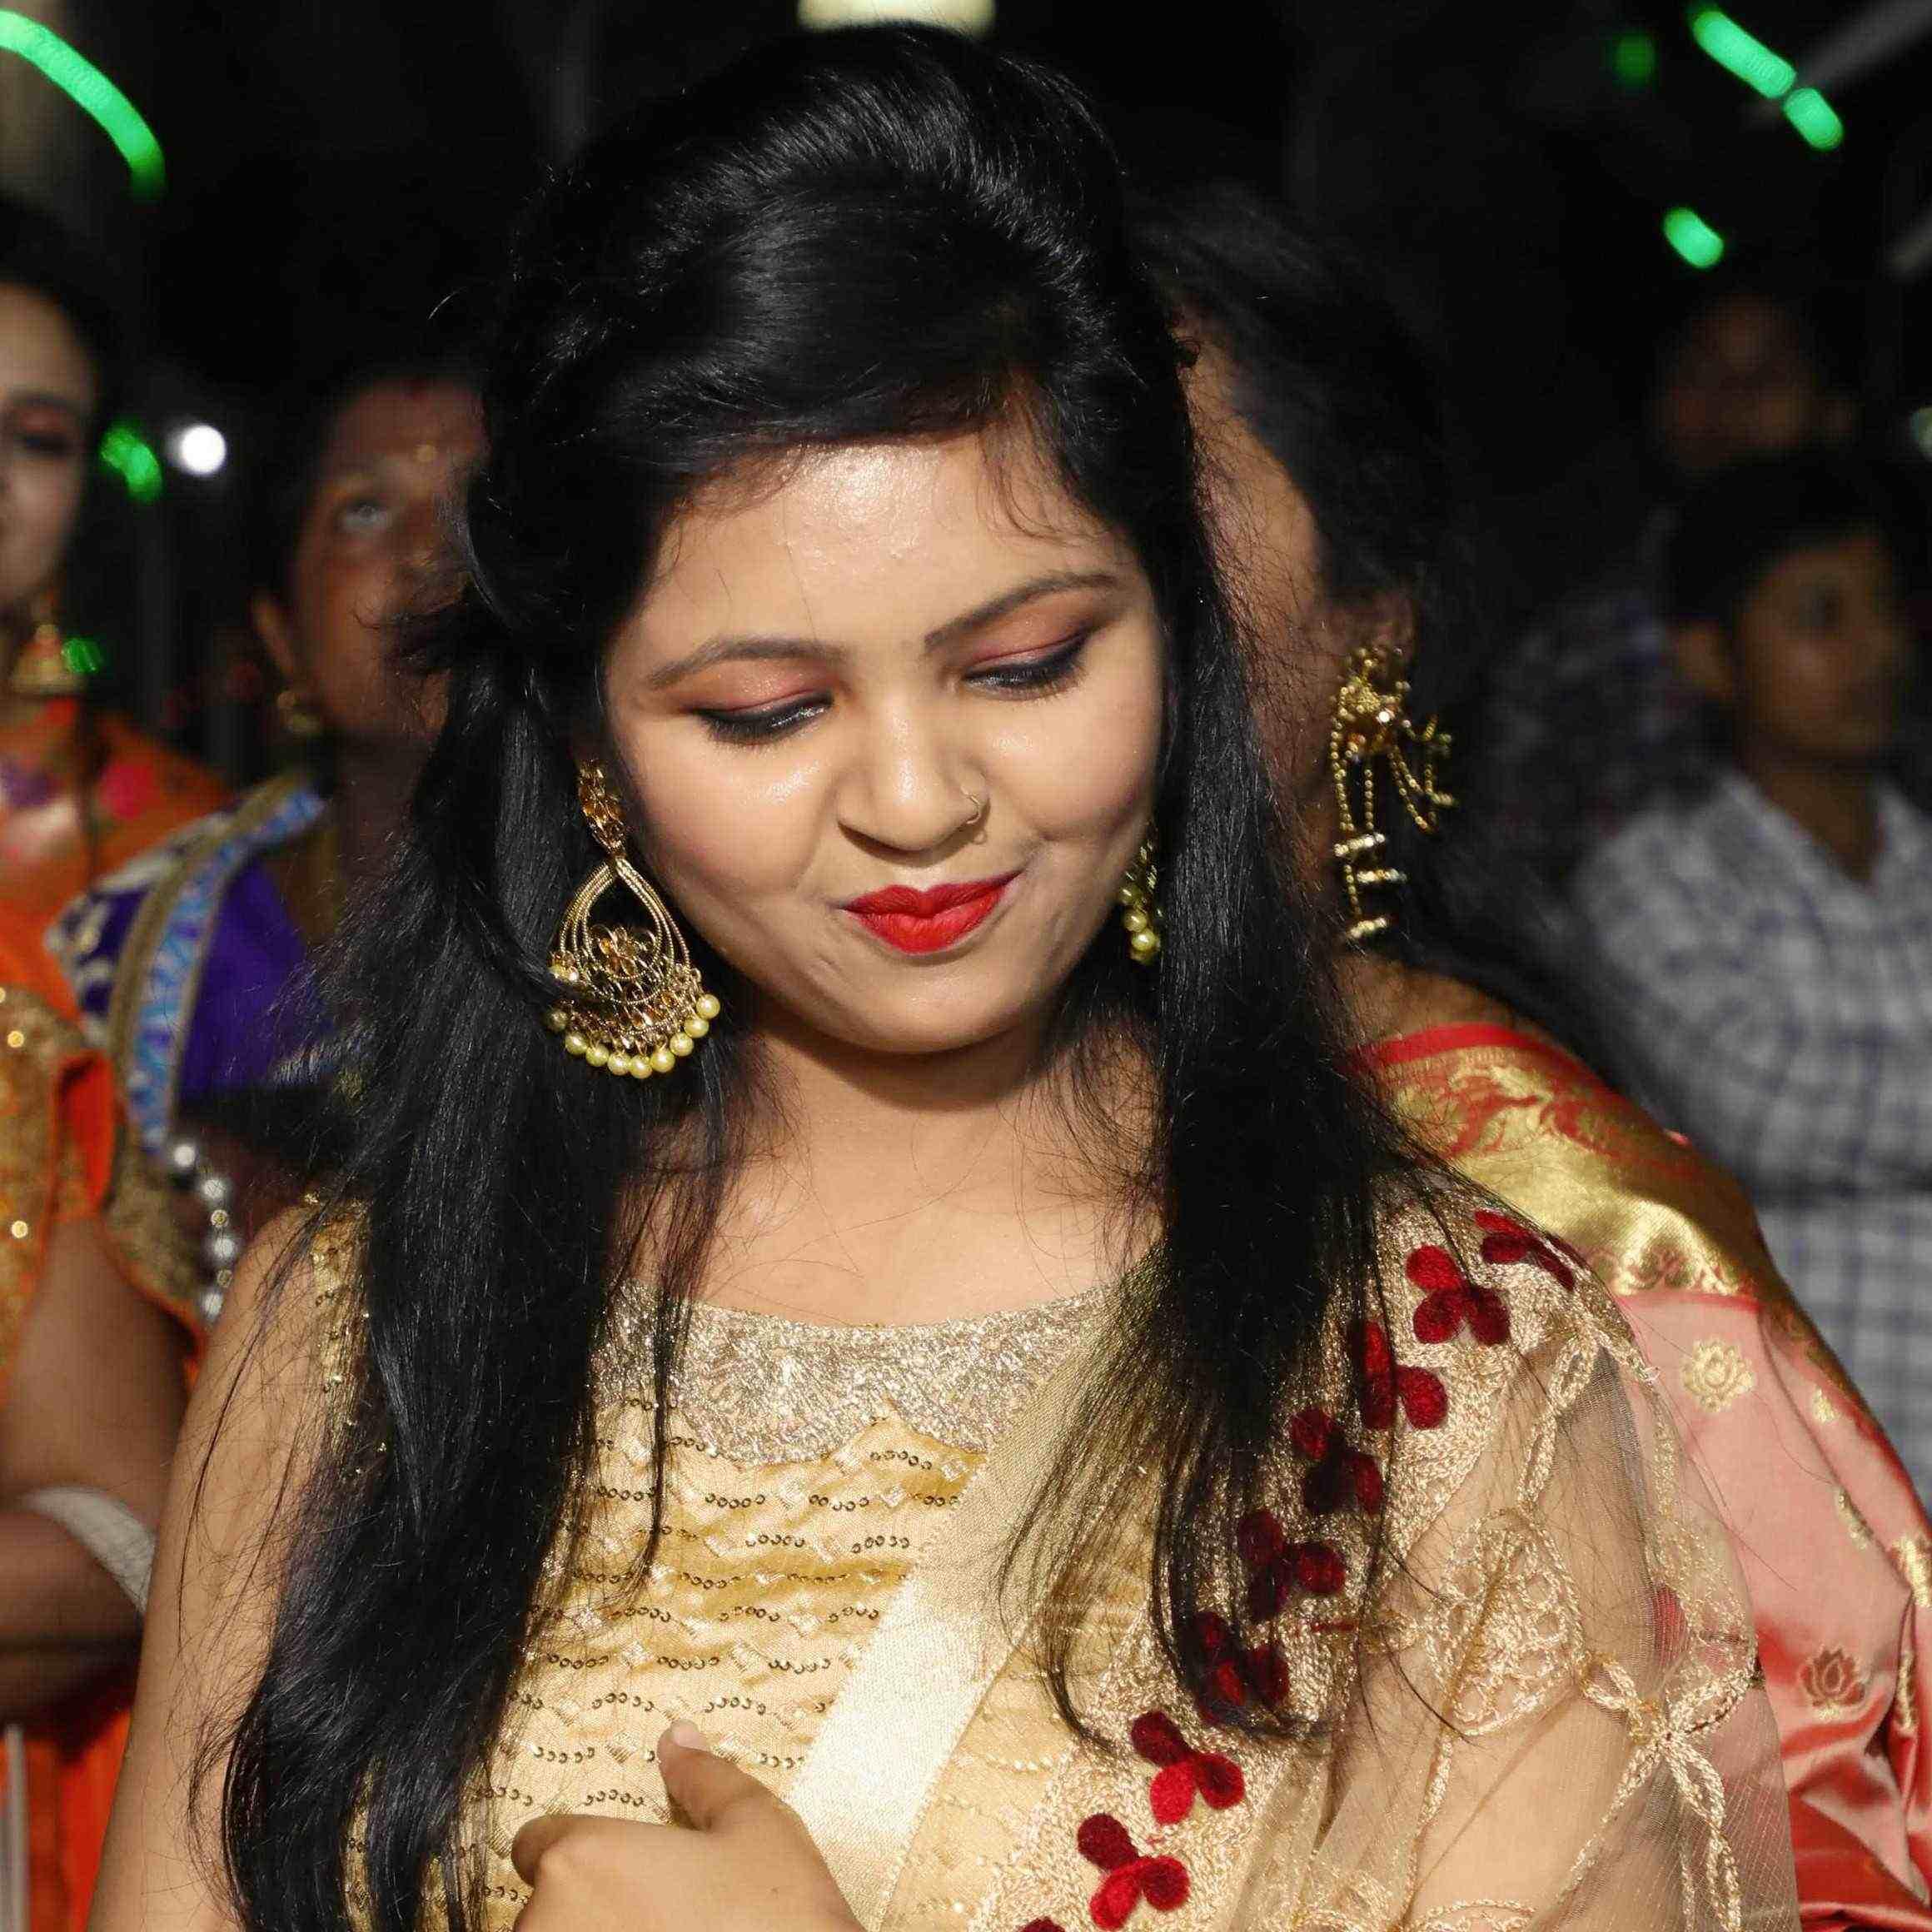 Sapna Chauhan